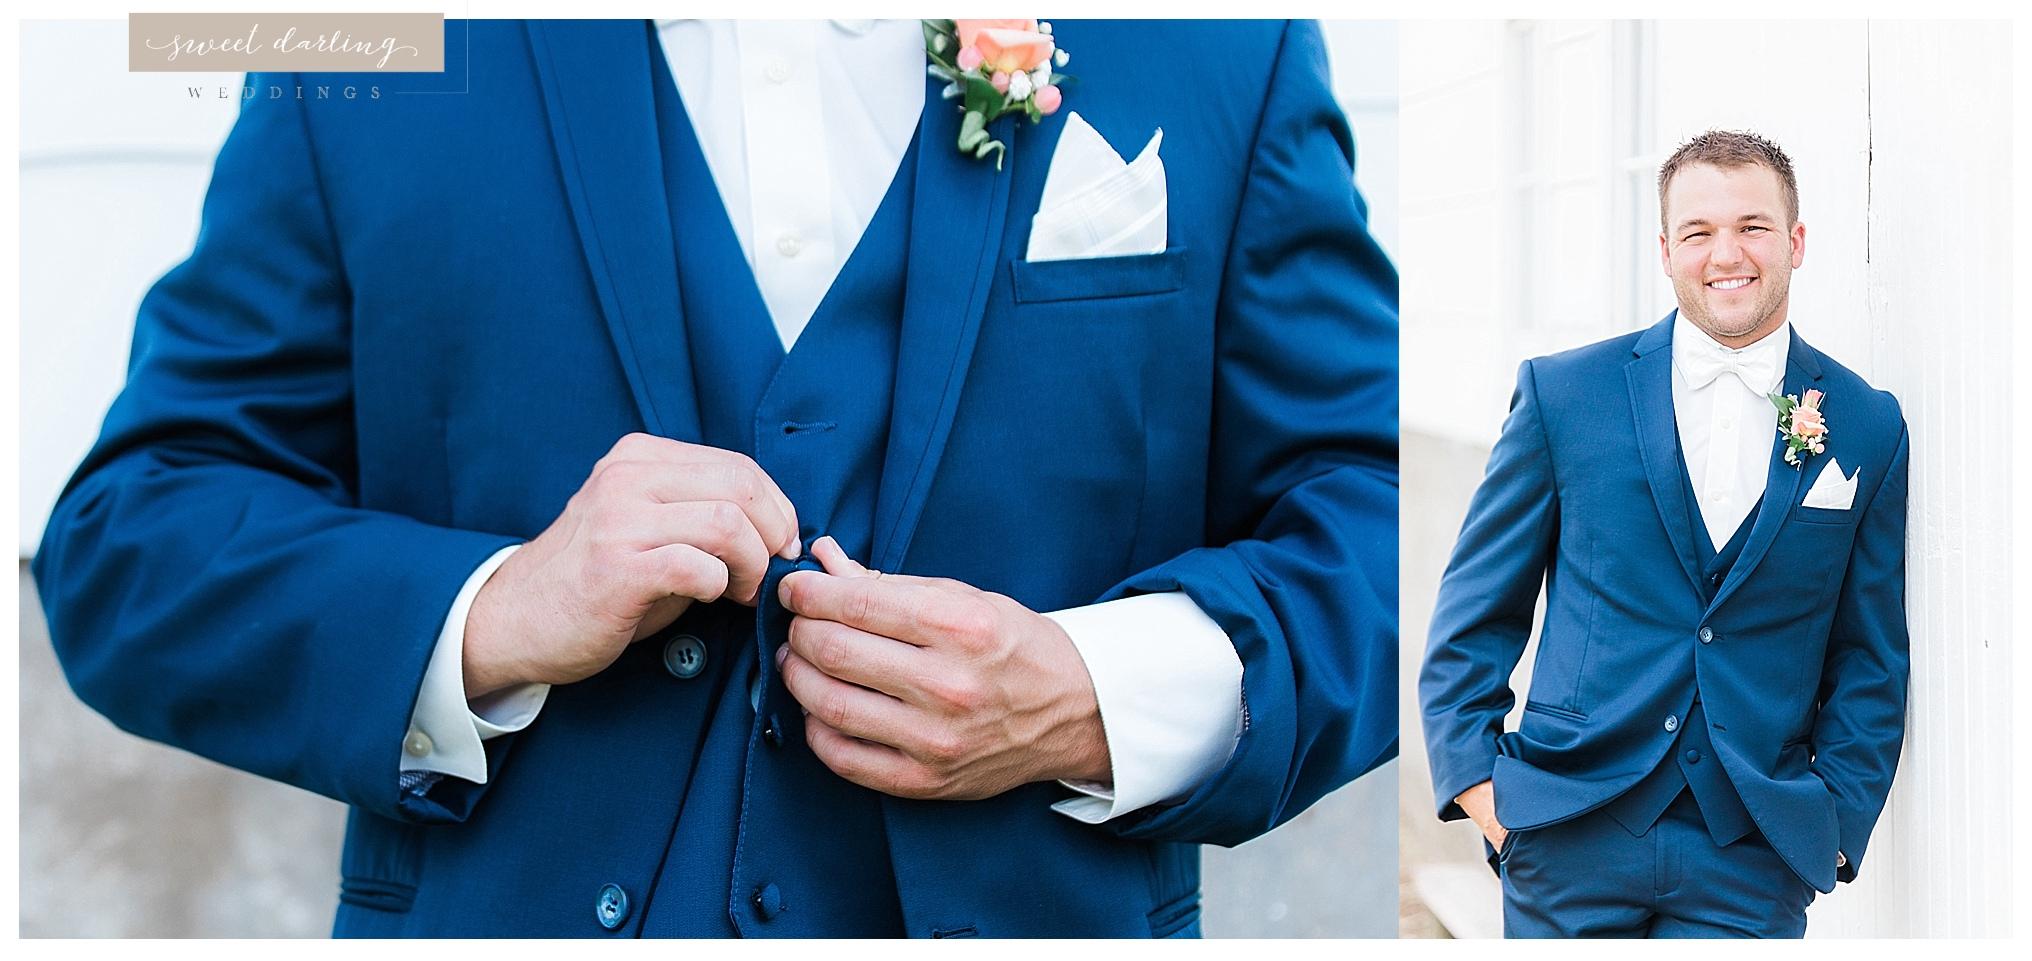 Paxton-illinois-engelbrecht-farmstead-romantic-wedding-photographer-sweet-darling-weddings_1244.jpg